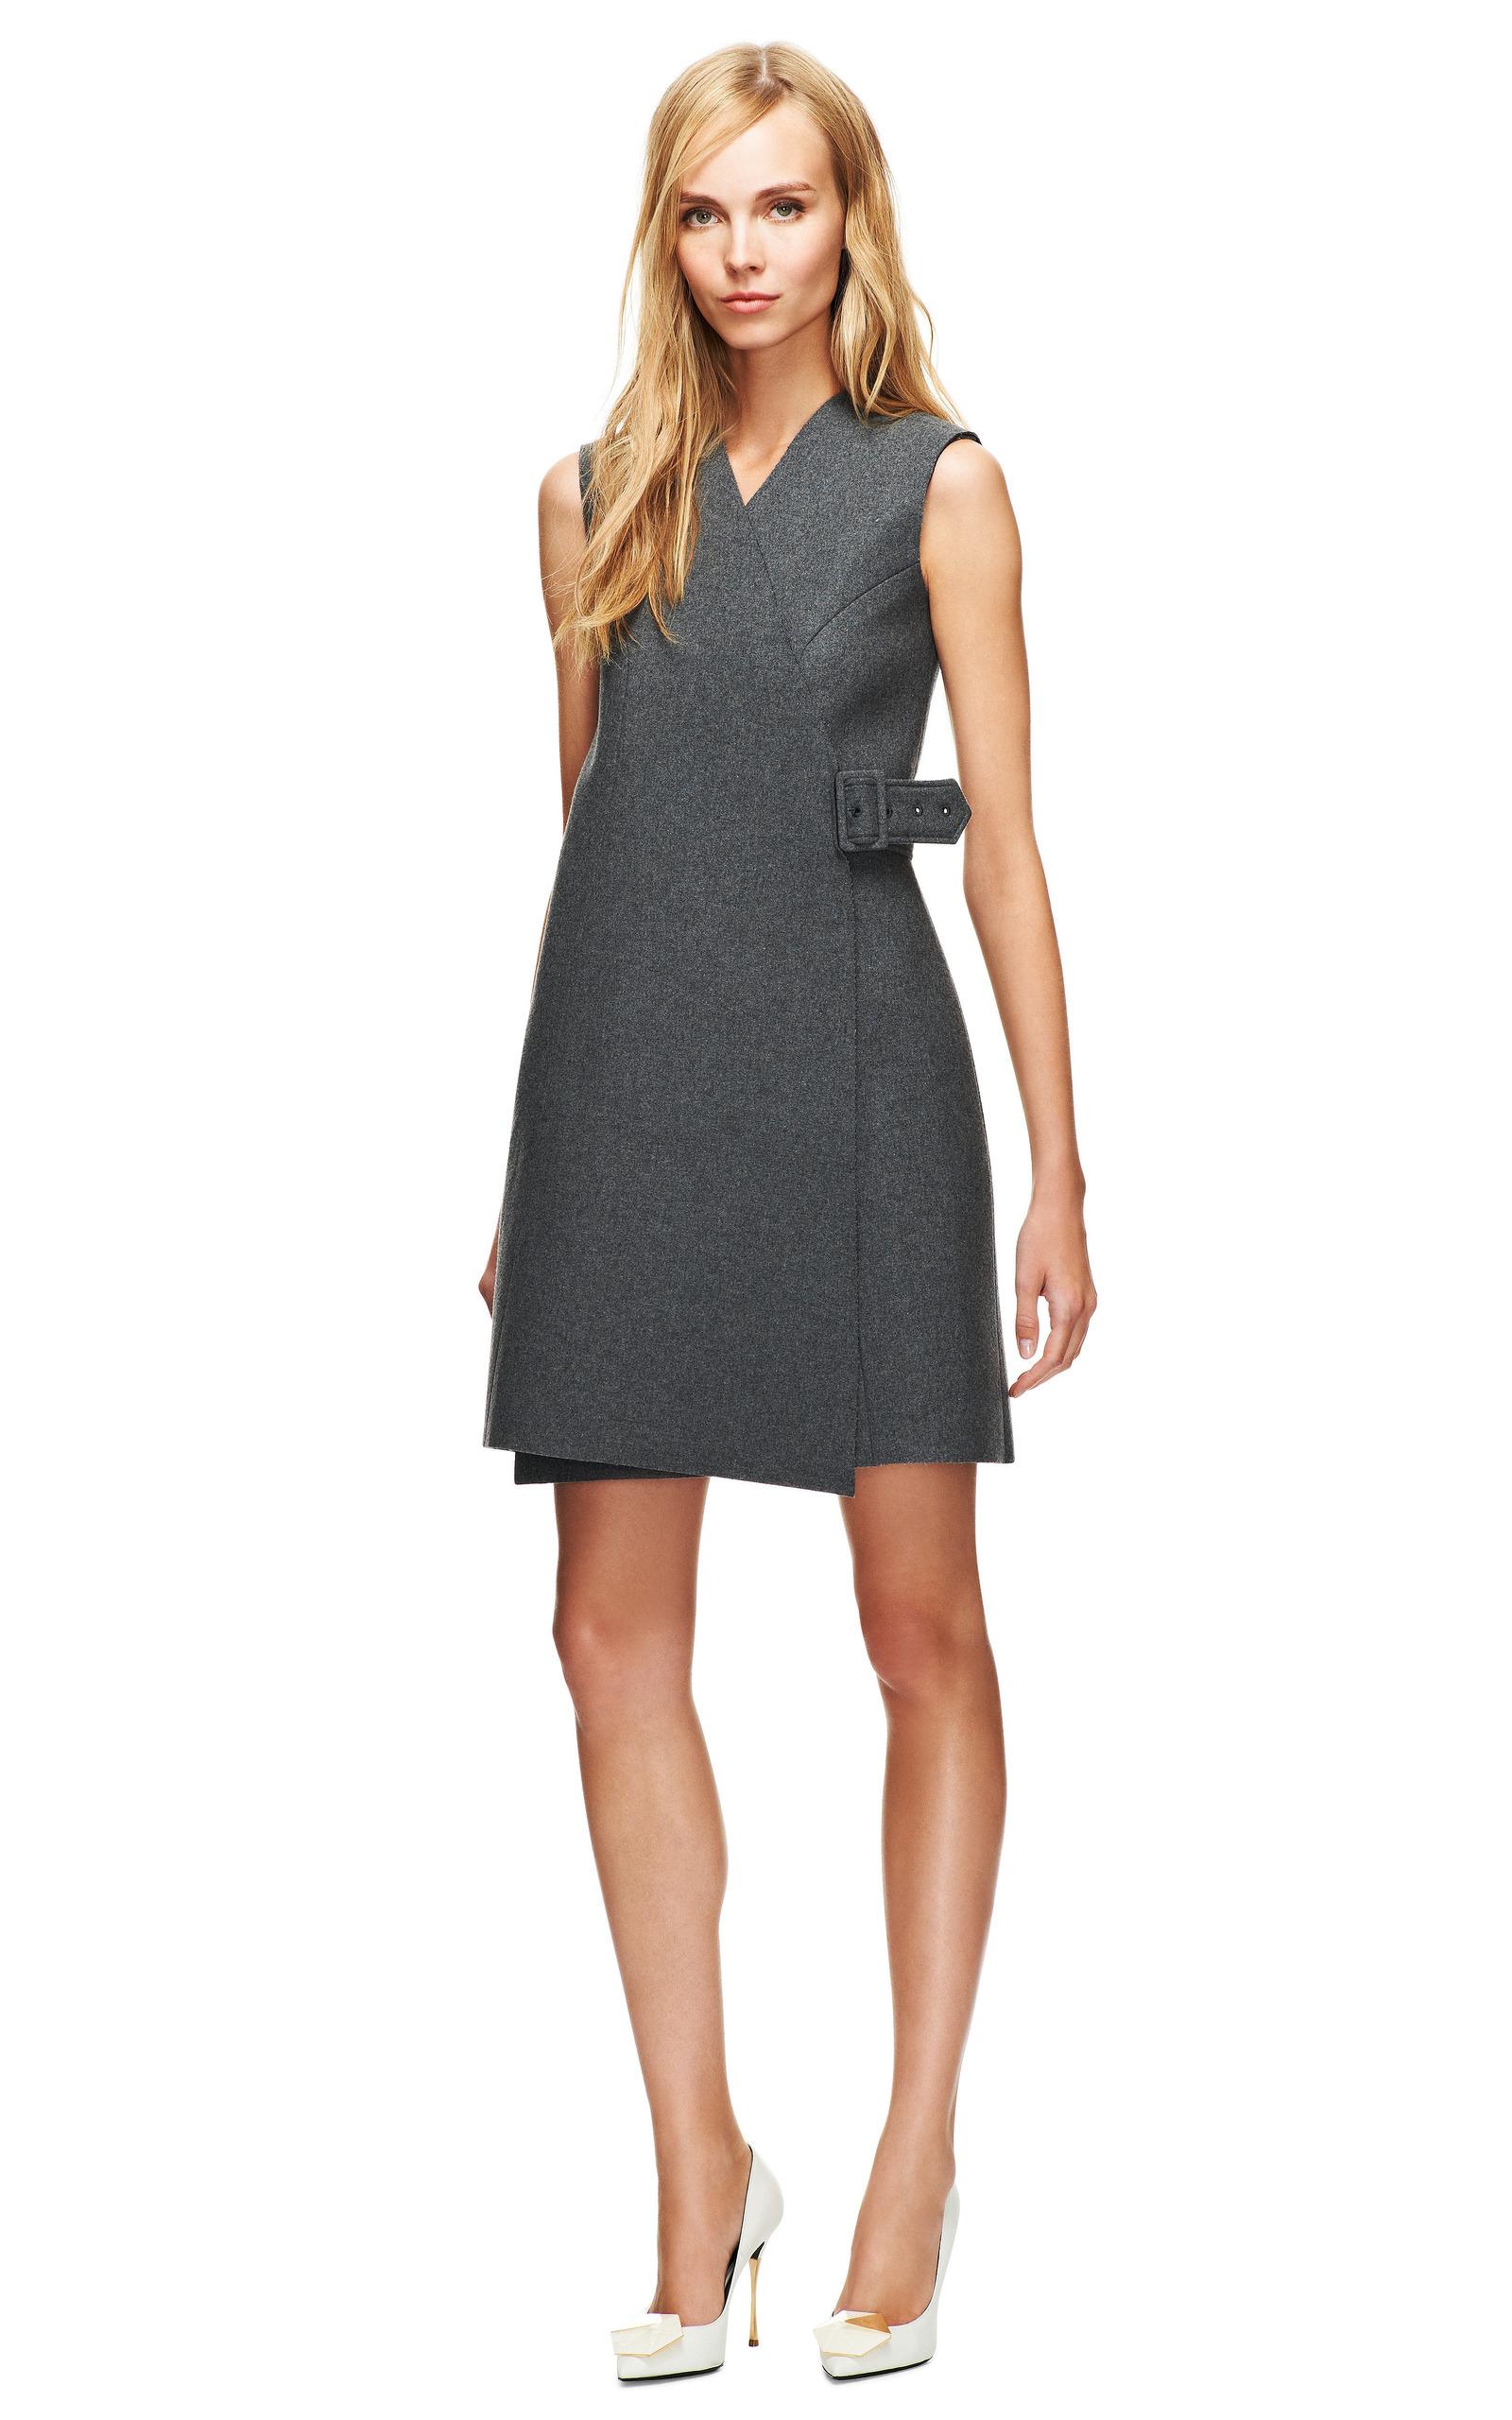 34d6b62666bcd JW AndersonBonded Neoprene Wool Dress. CLOSE. Loading. Loading